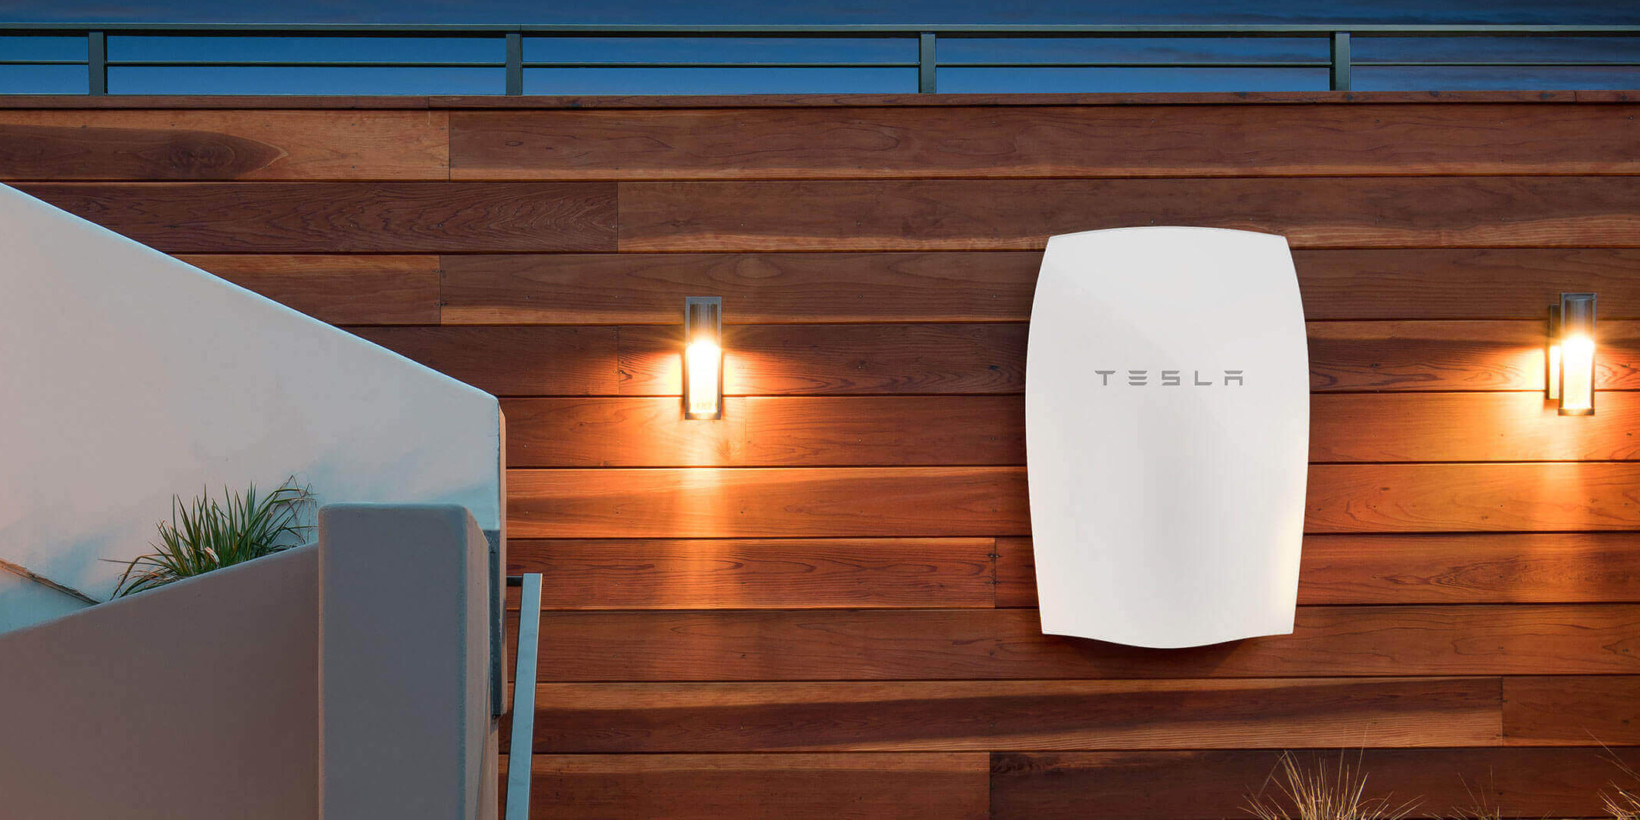 Tesla is buying SolarCity for $2.6 billion